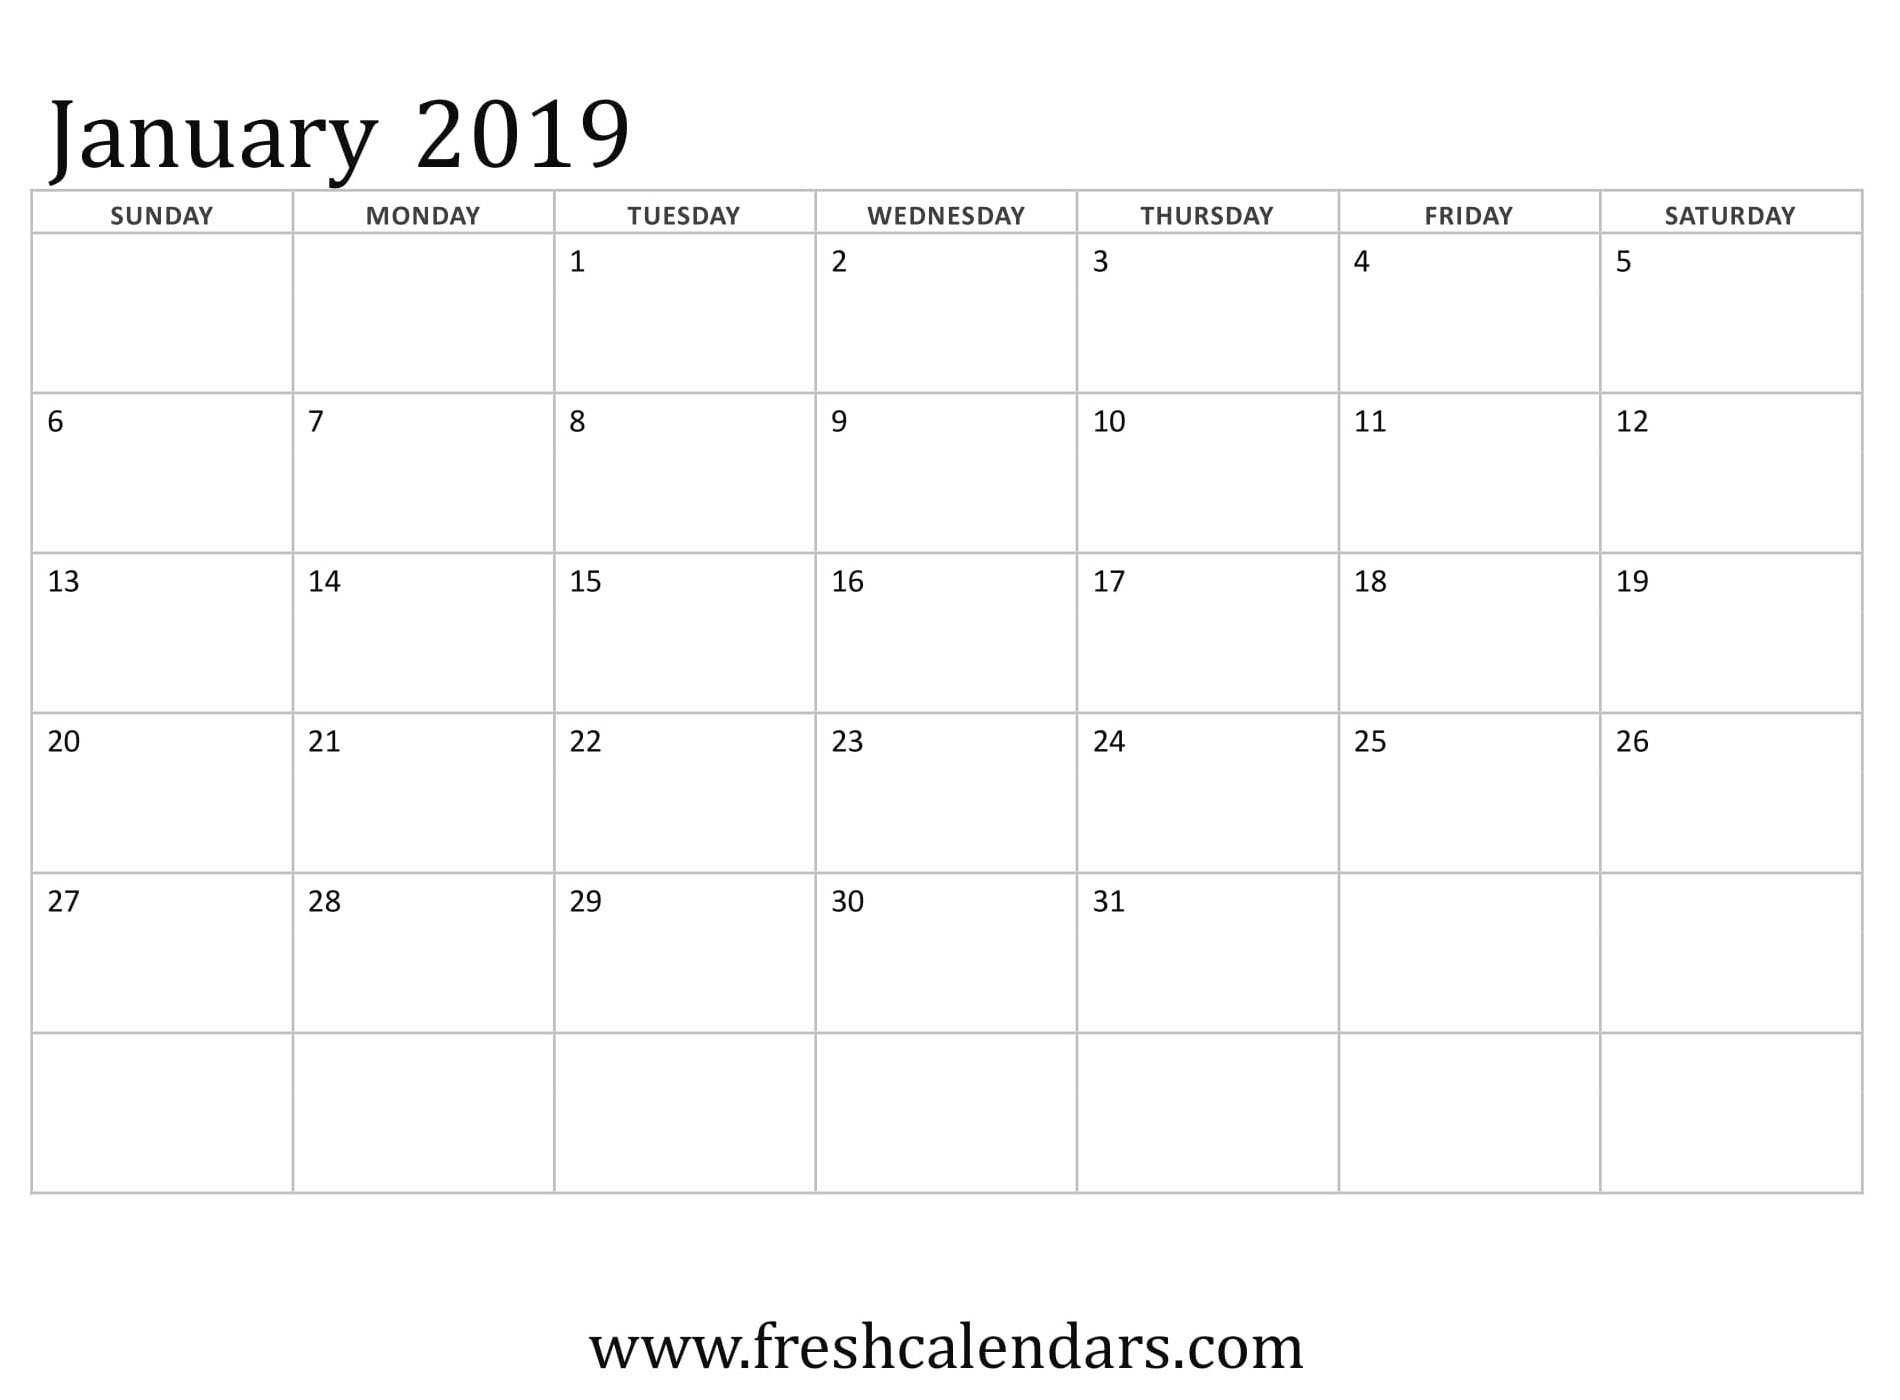 January 2019 Calendar Printable – Fresh Calendars Calendar 2019 January Template